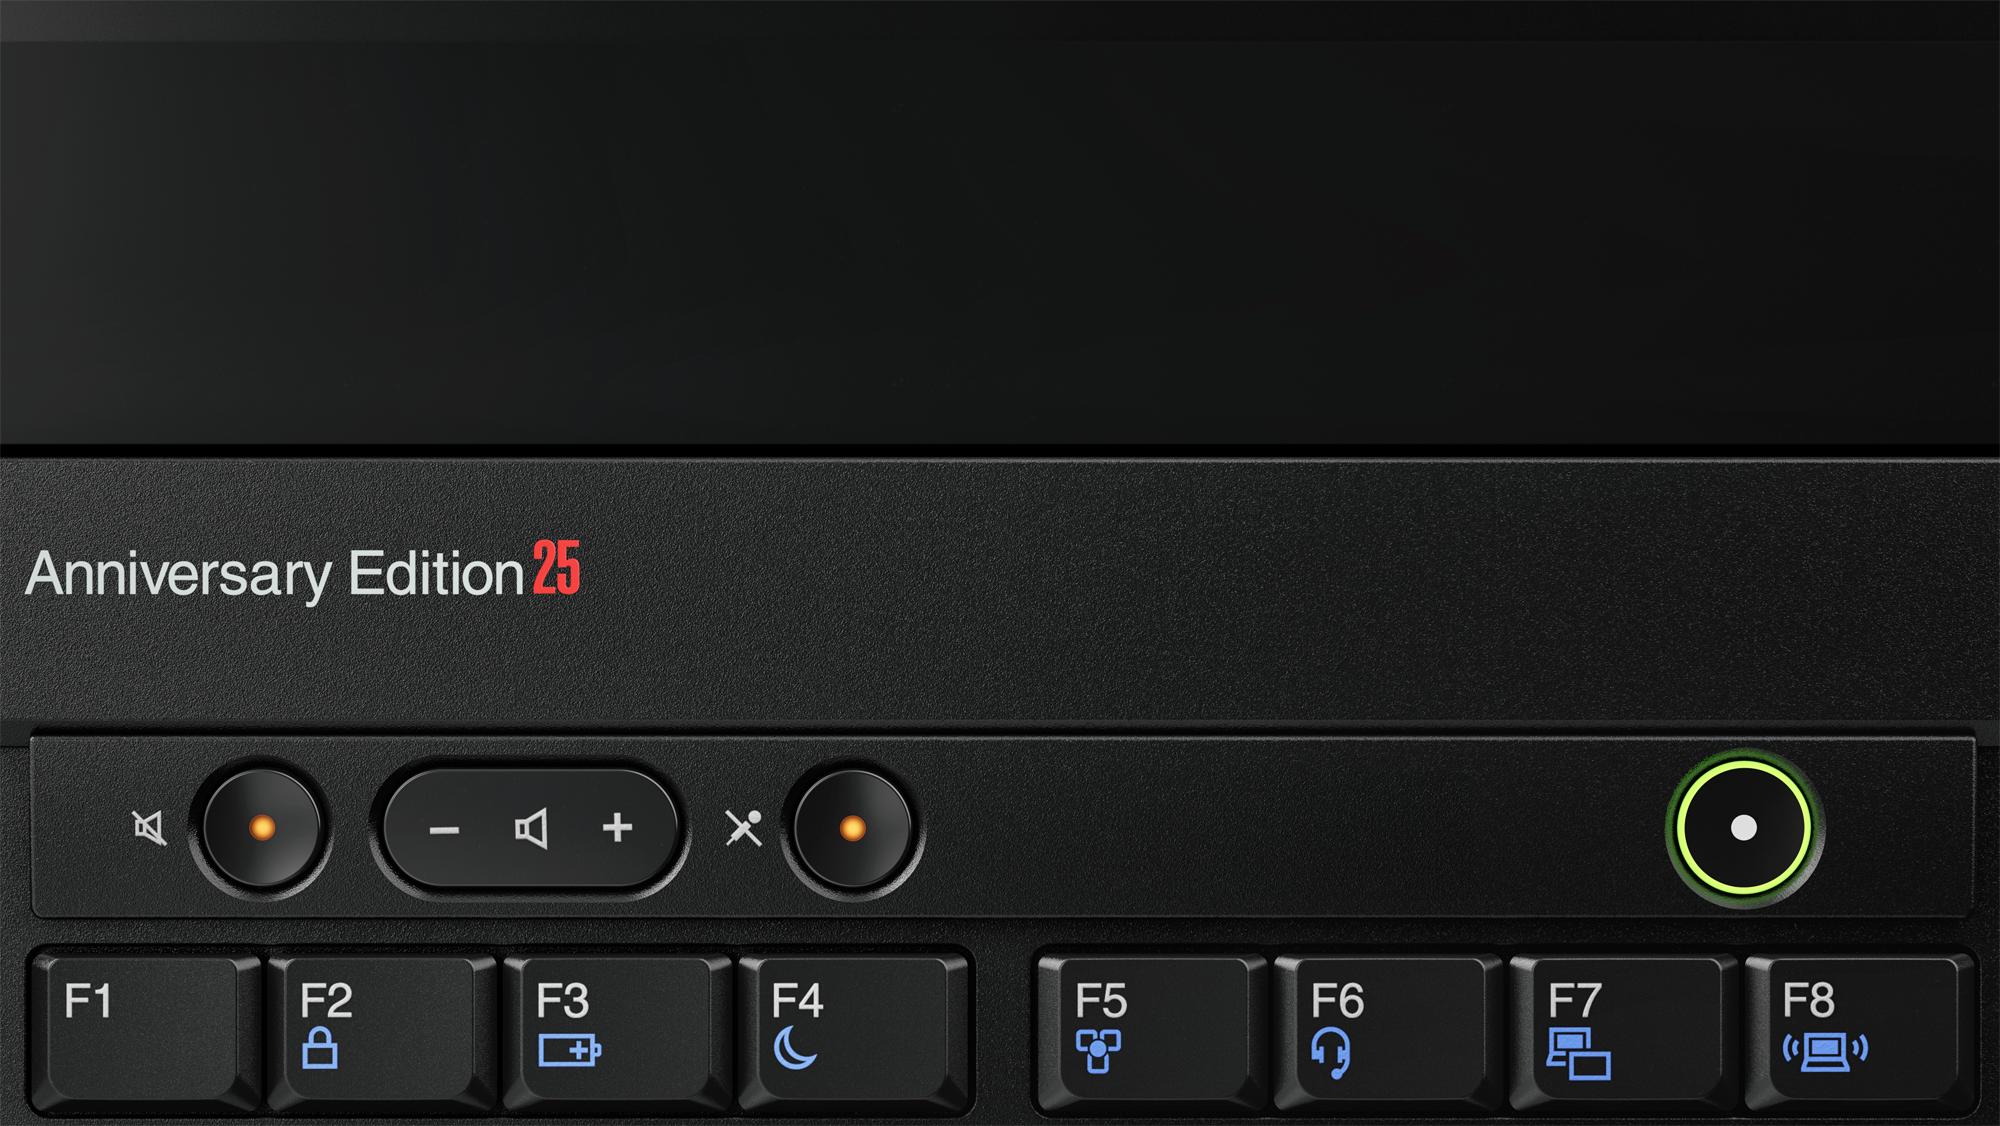 Lenovo unveils retro ThinkPad for 25th anniversary - The Verge